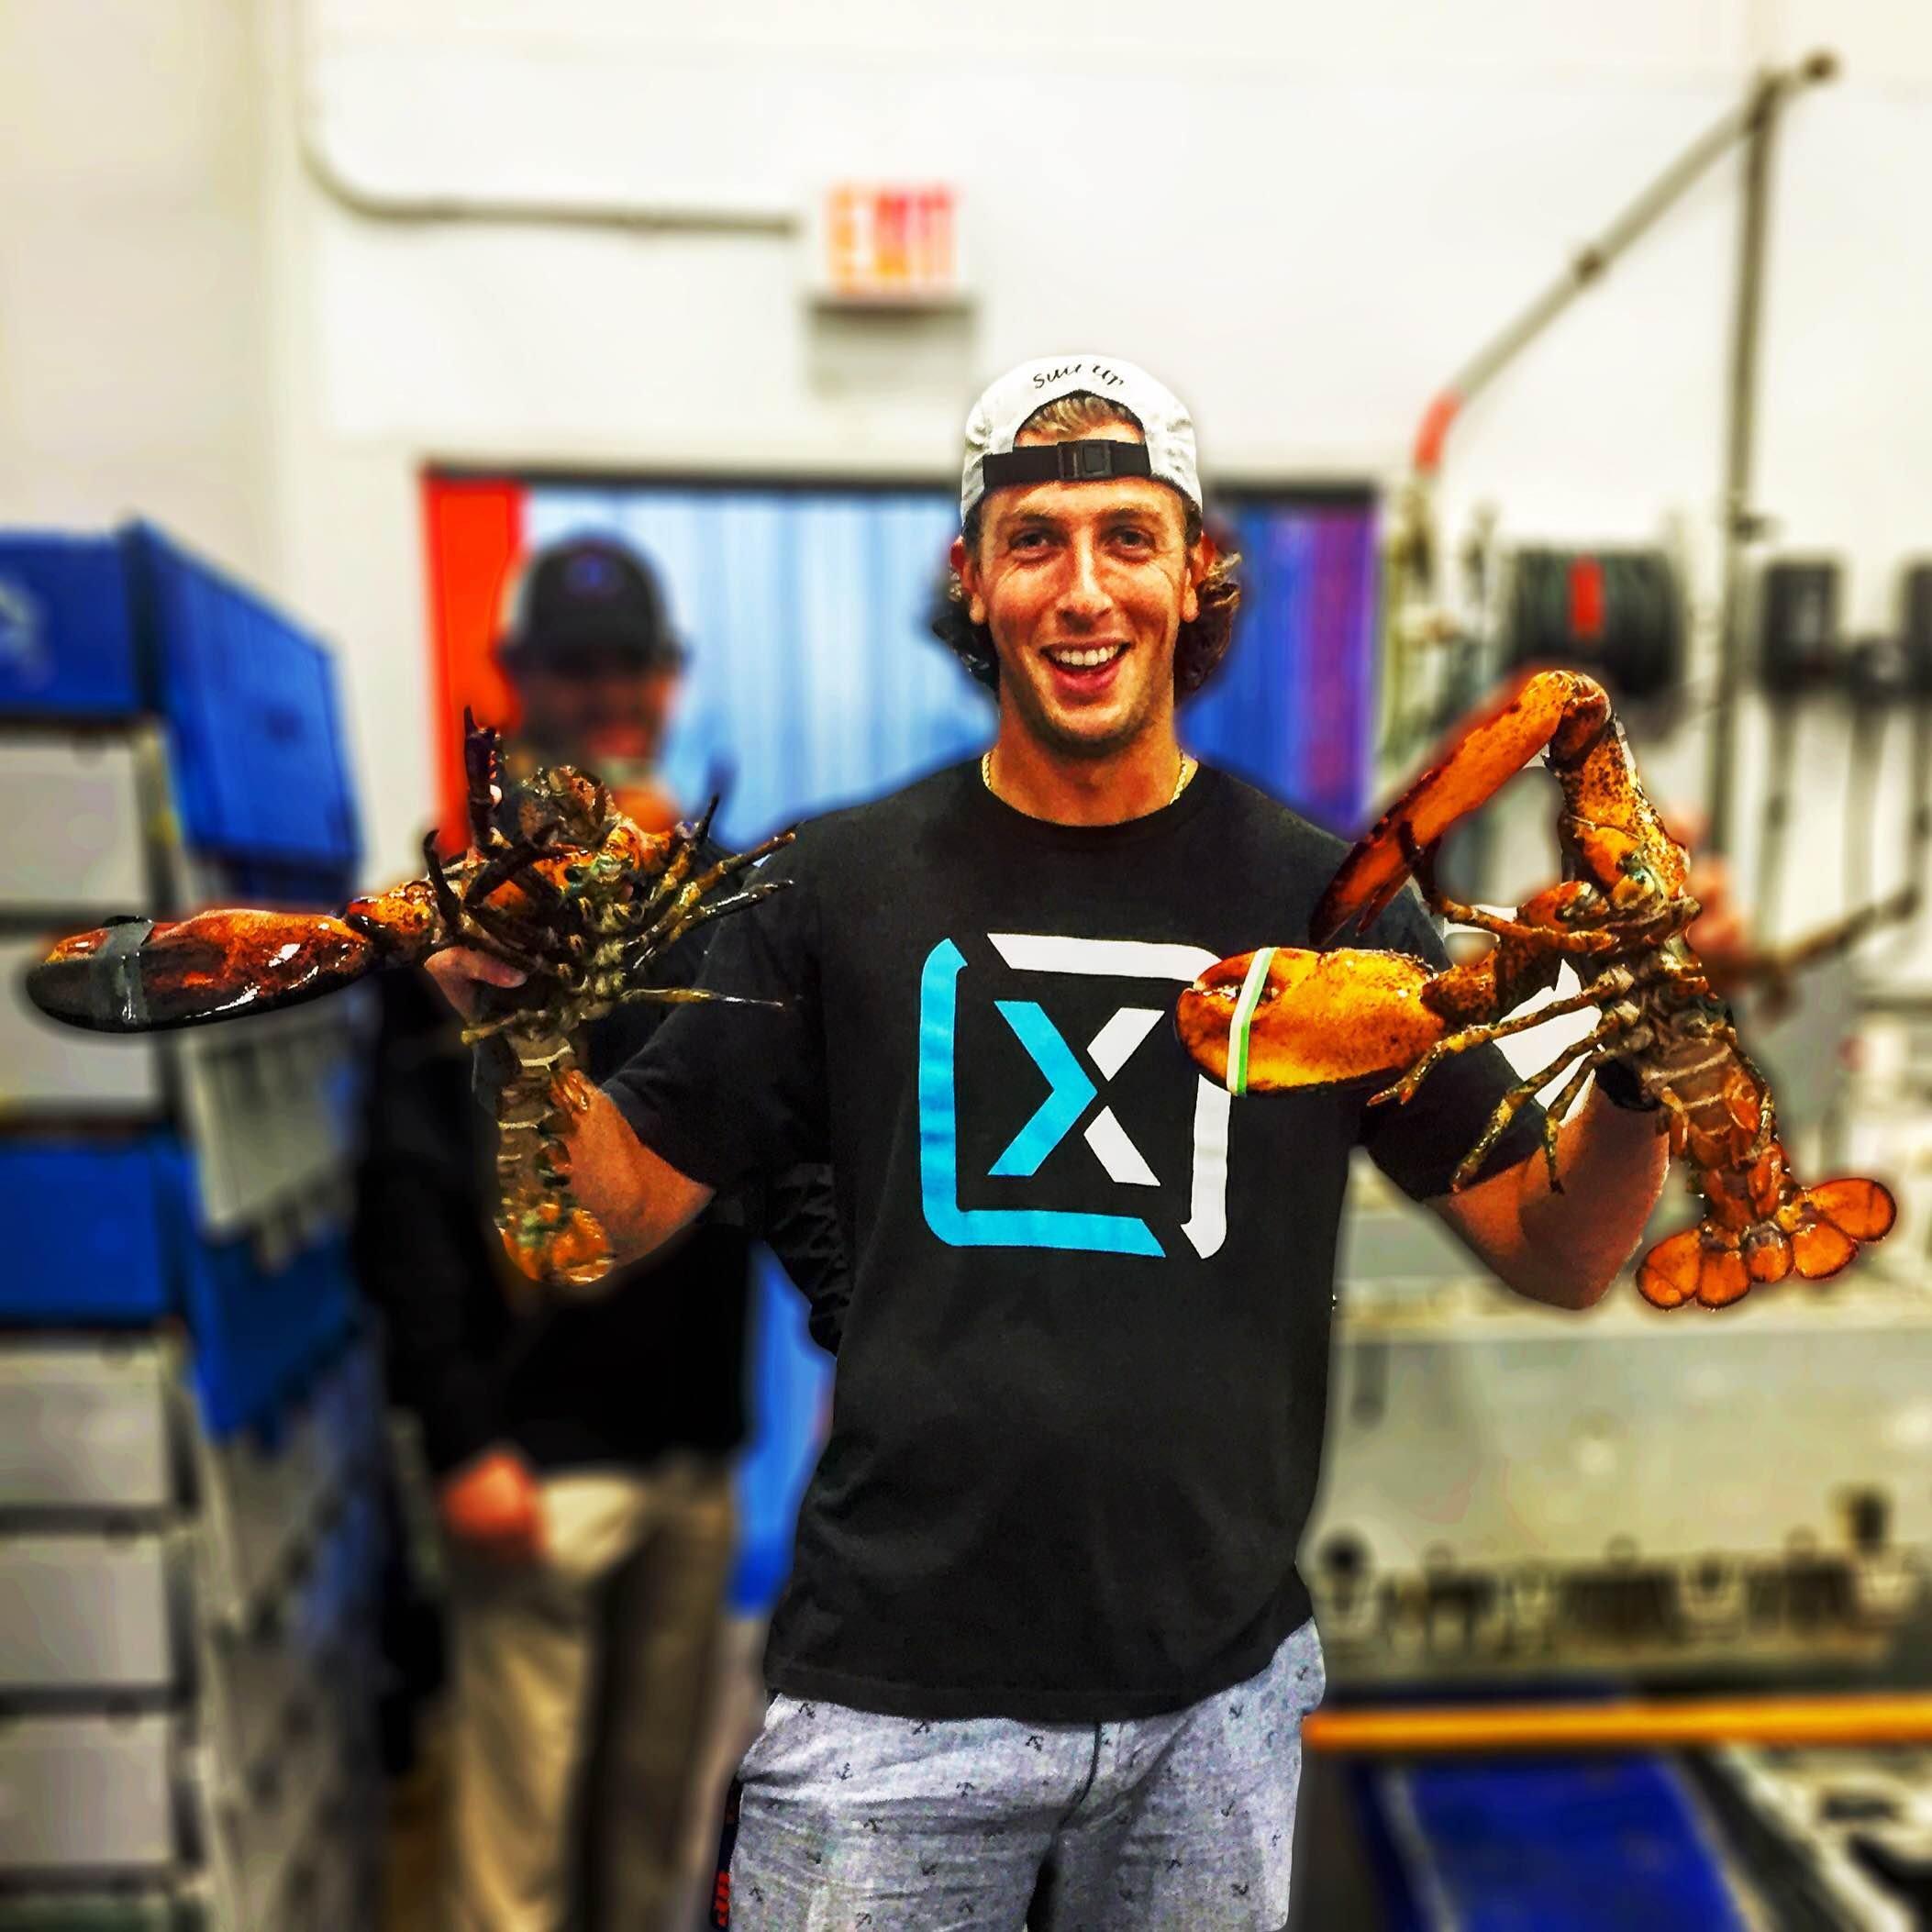 Steel_Lobster_Pic_JSG